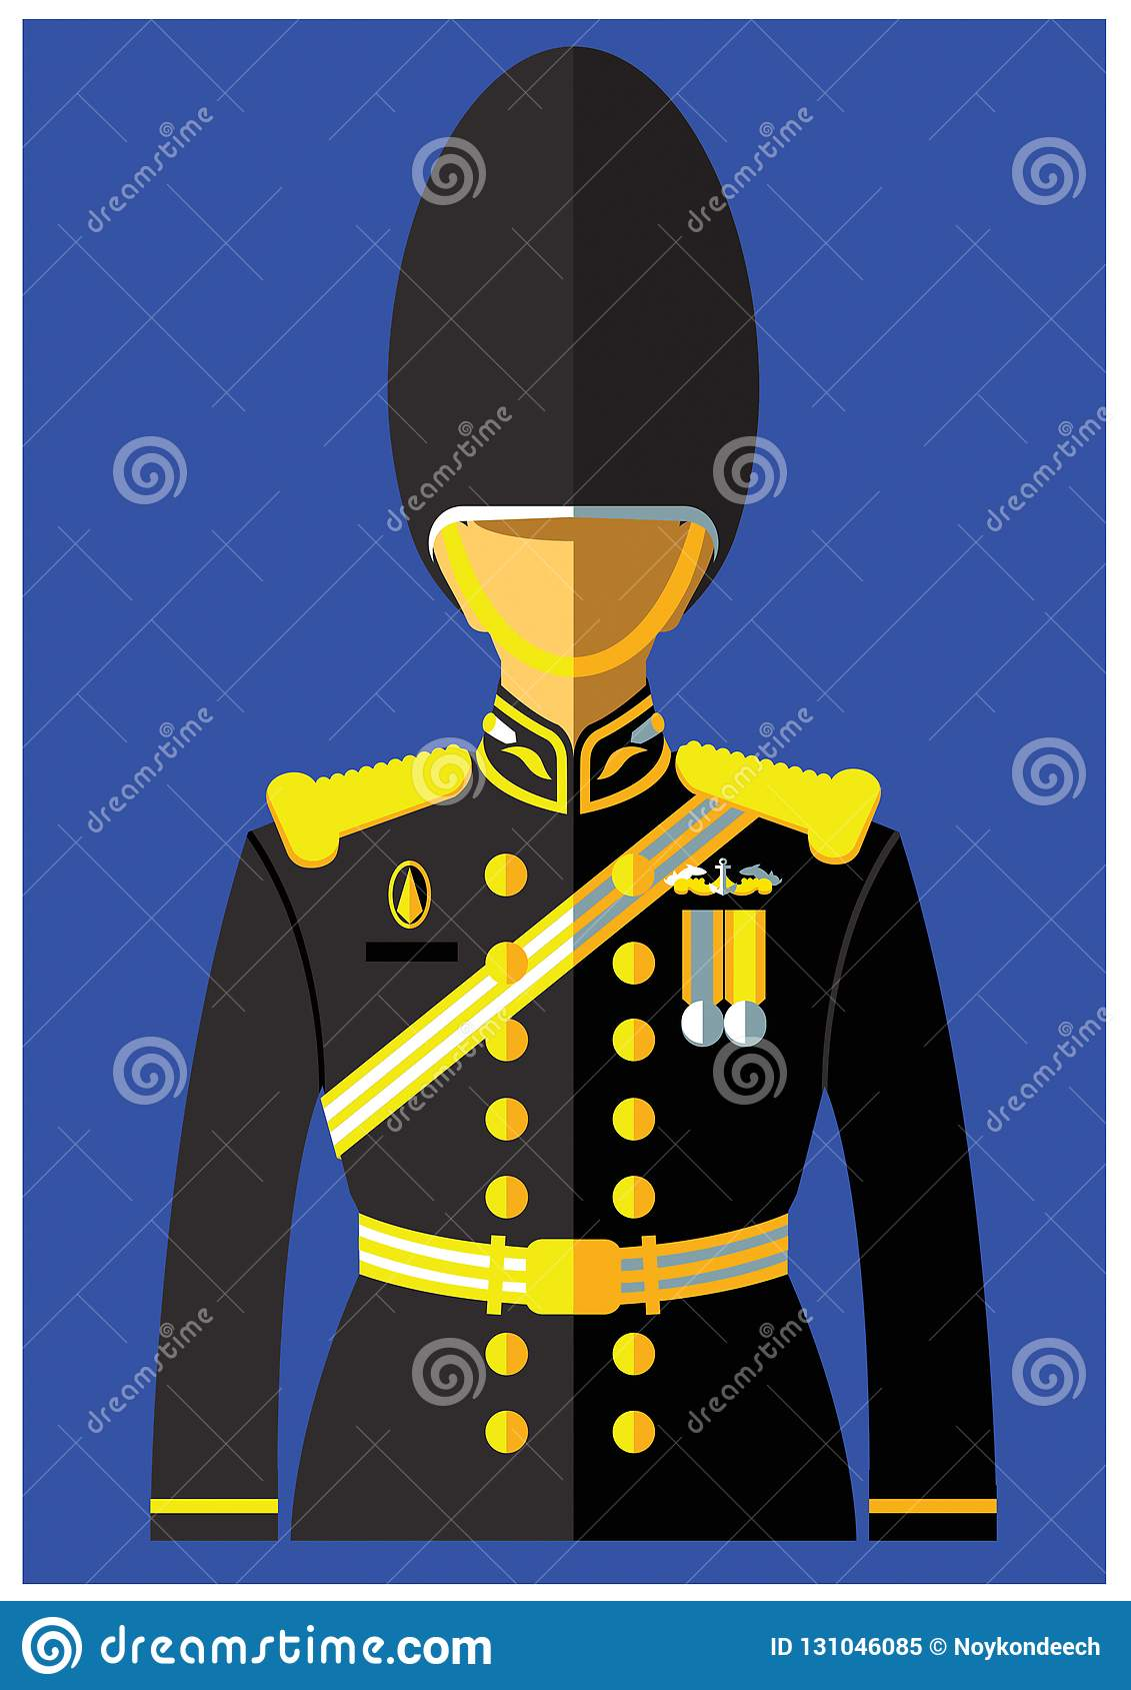 Una clase de uniforme de la marina de guerra